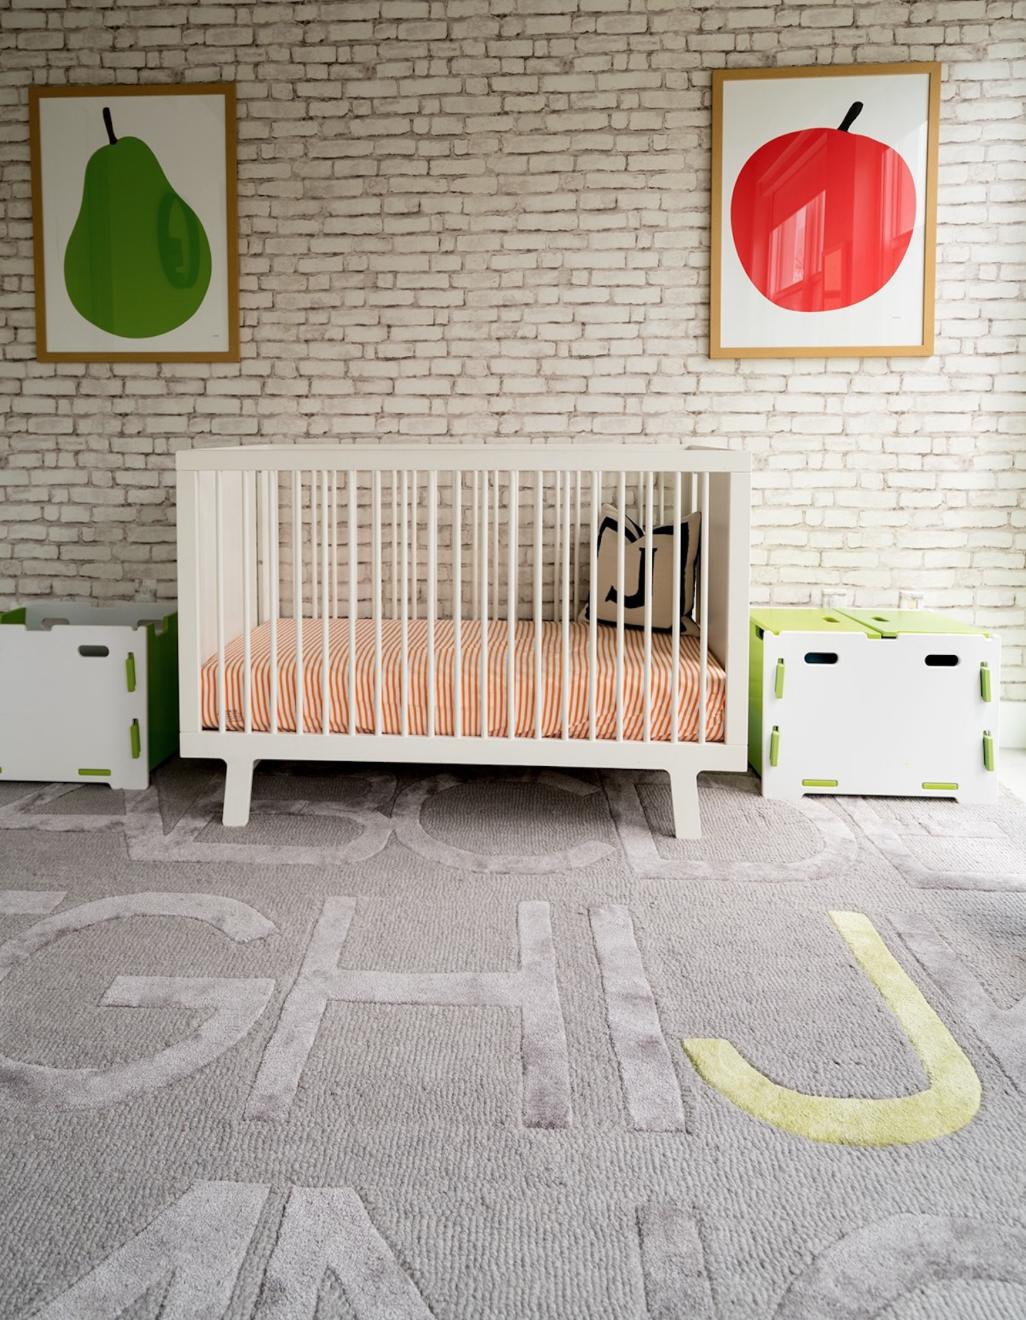 Photo courtesy of Project Nursery